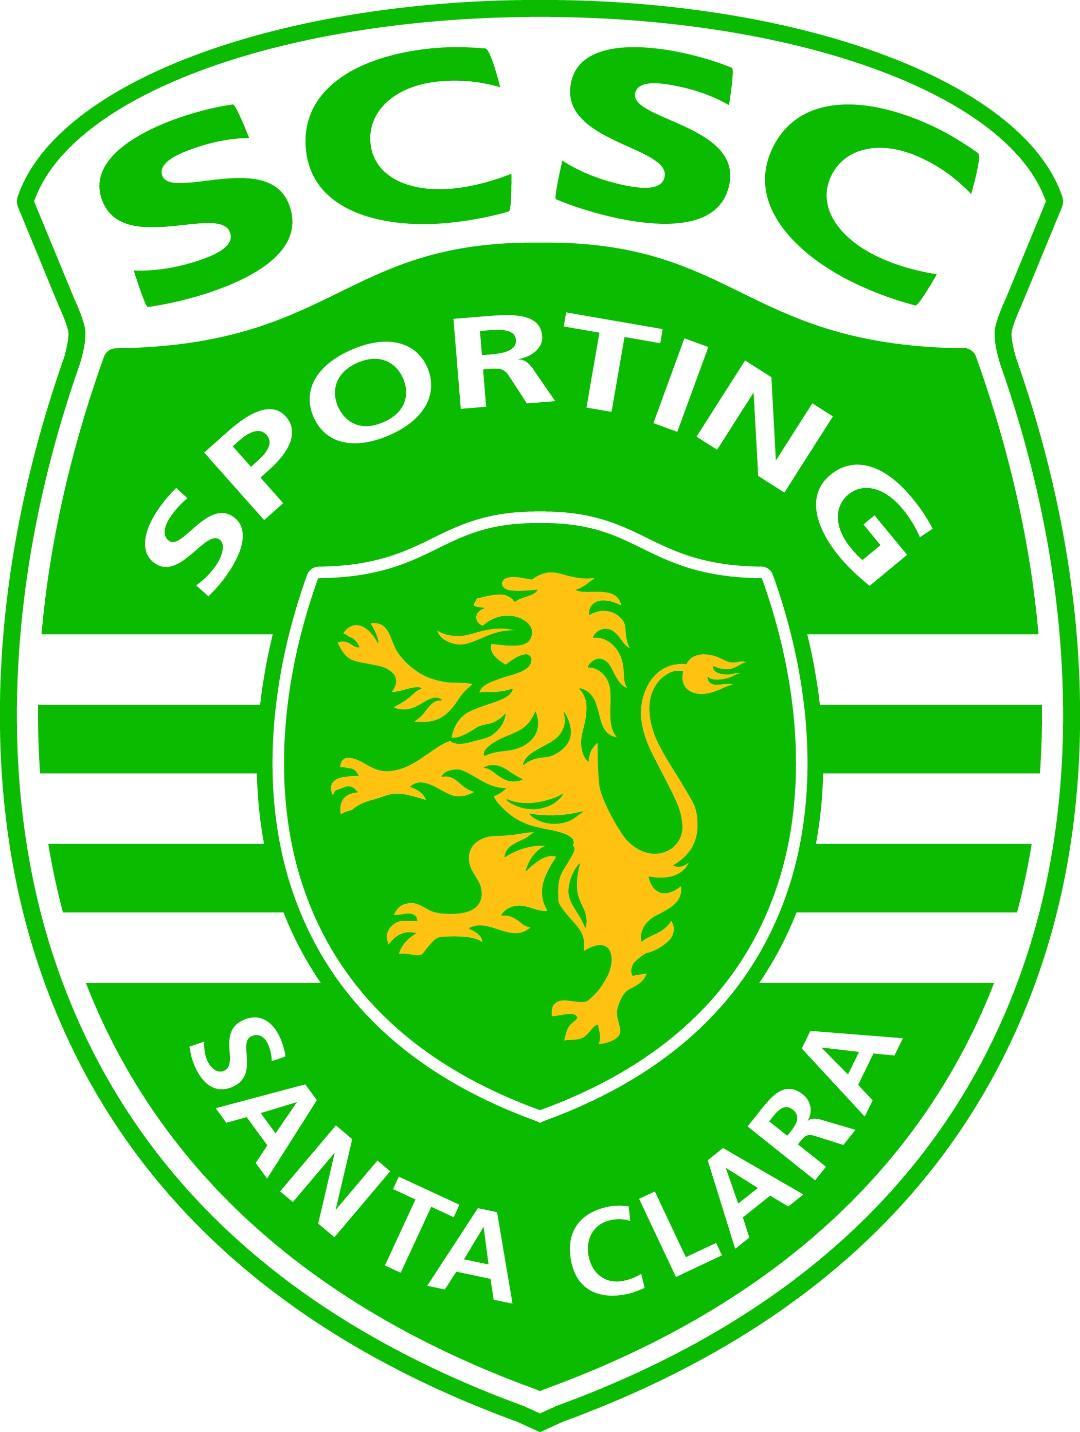 Santa Clara Sporting 01B Green